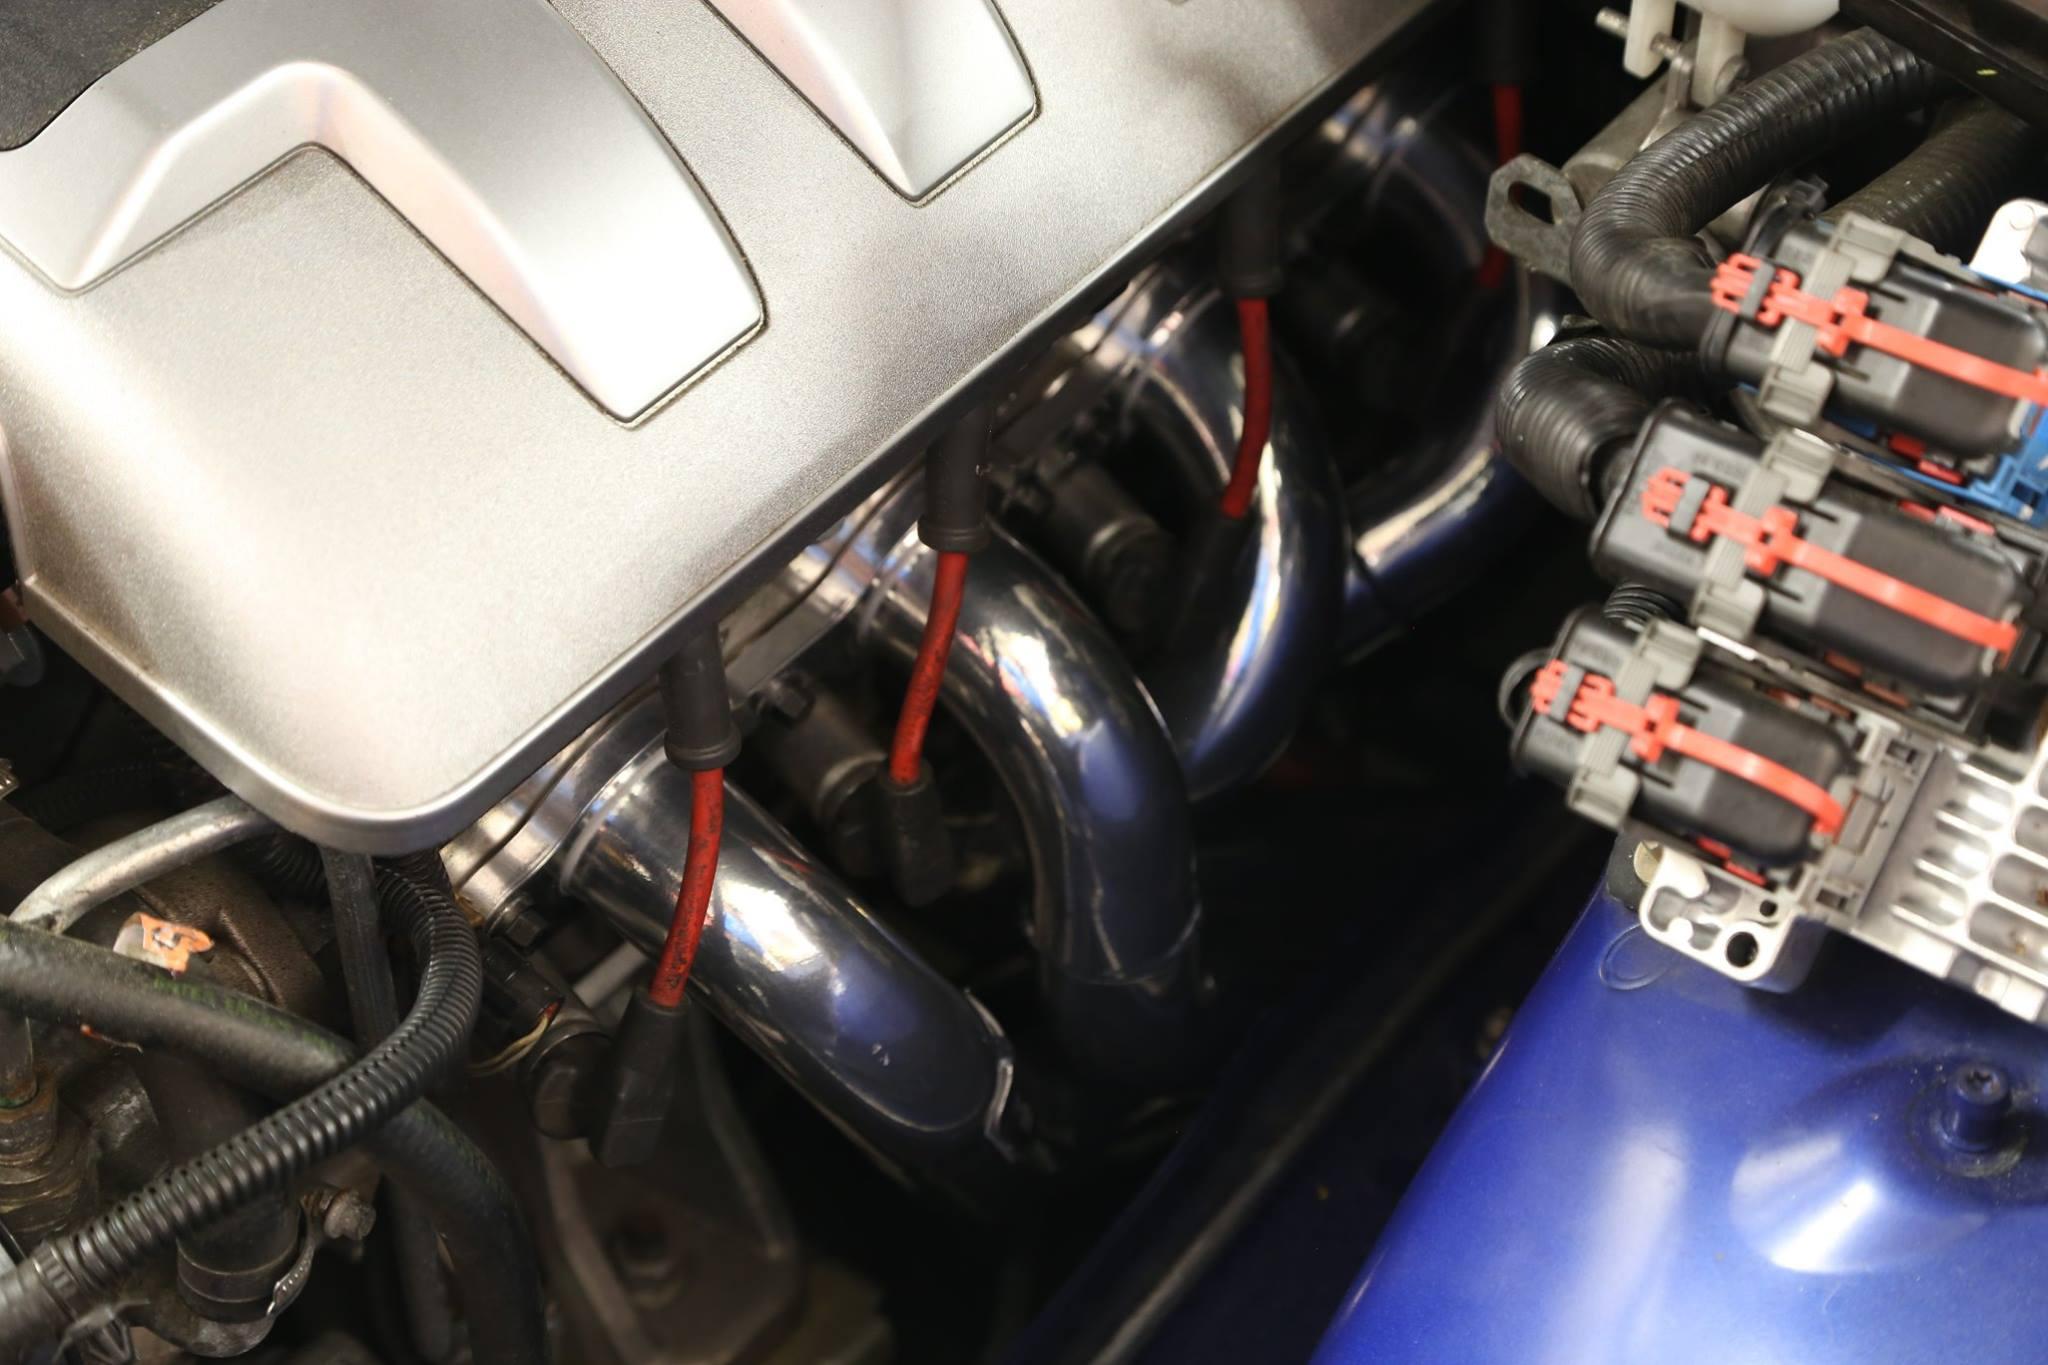 05 pontiac gto exhaust and tune trinity motorsports 05 pontiac gto exhaust and tune publicscrutiny Images